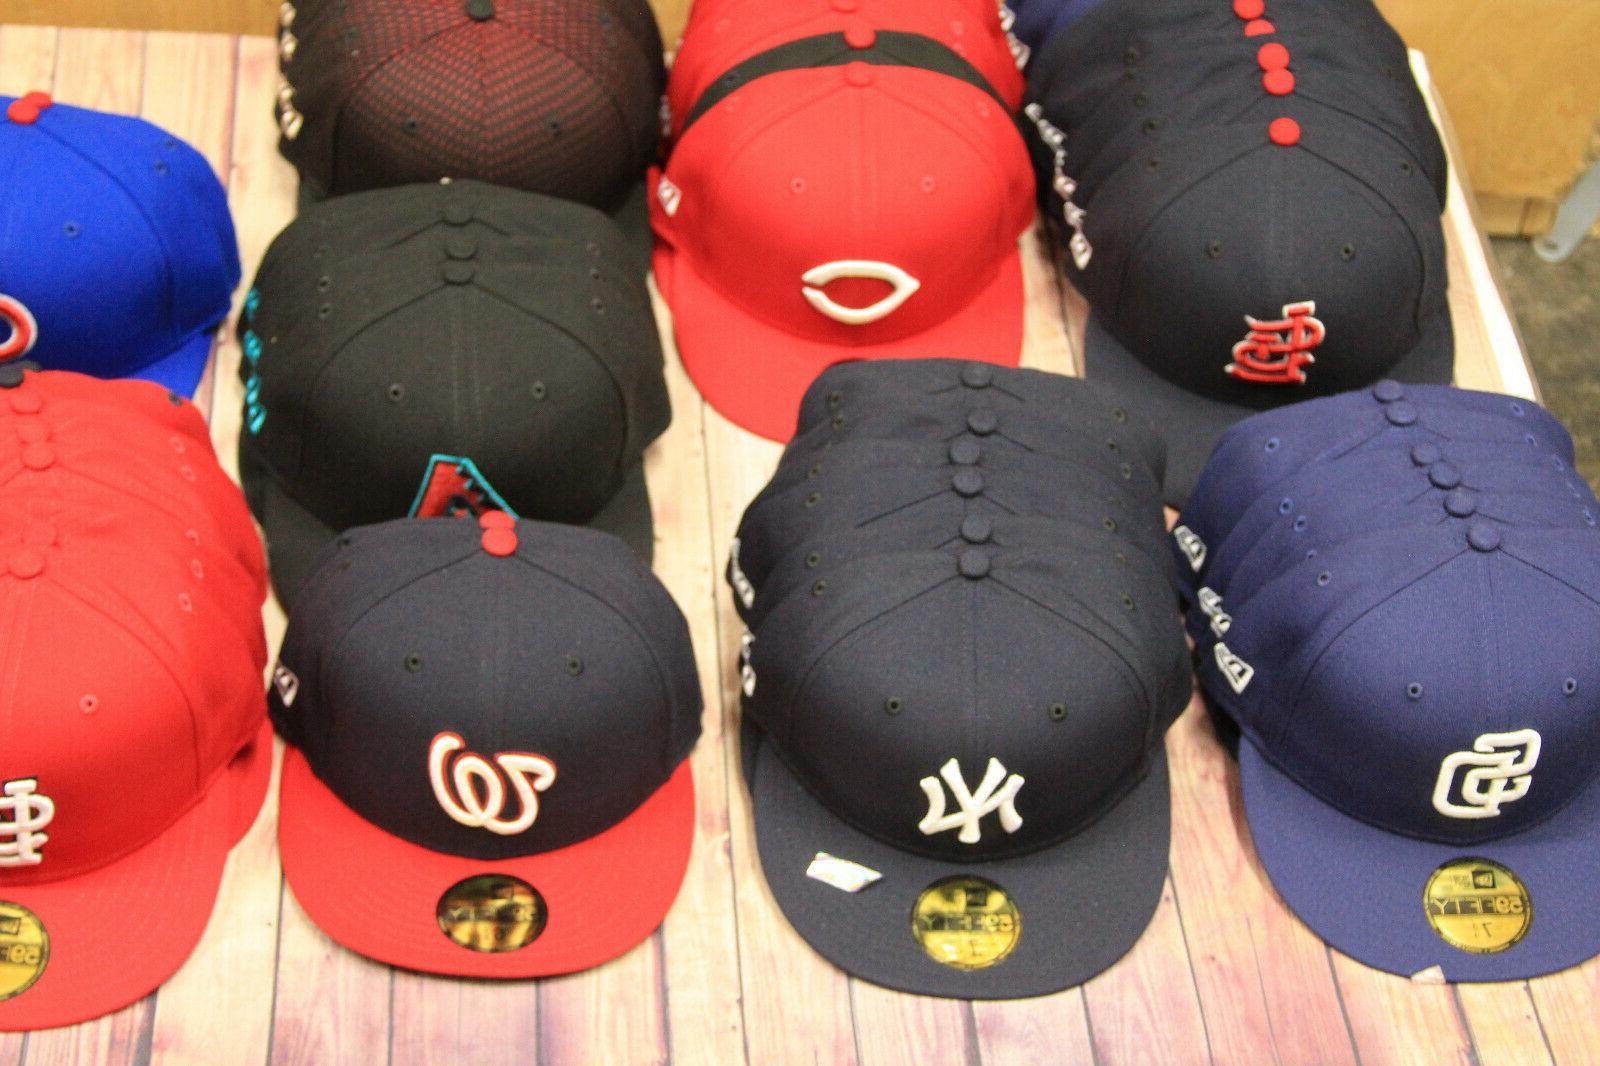 New Cap Yankees Cardinals Nationals Padres